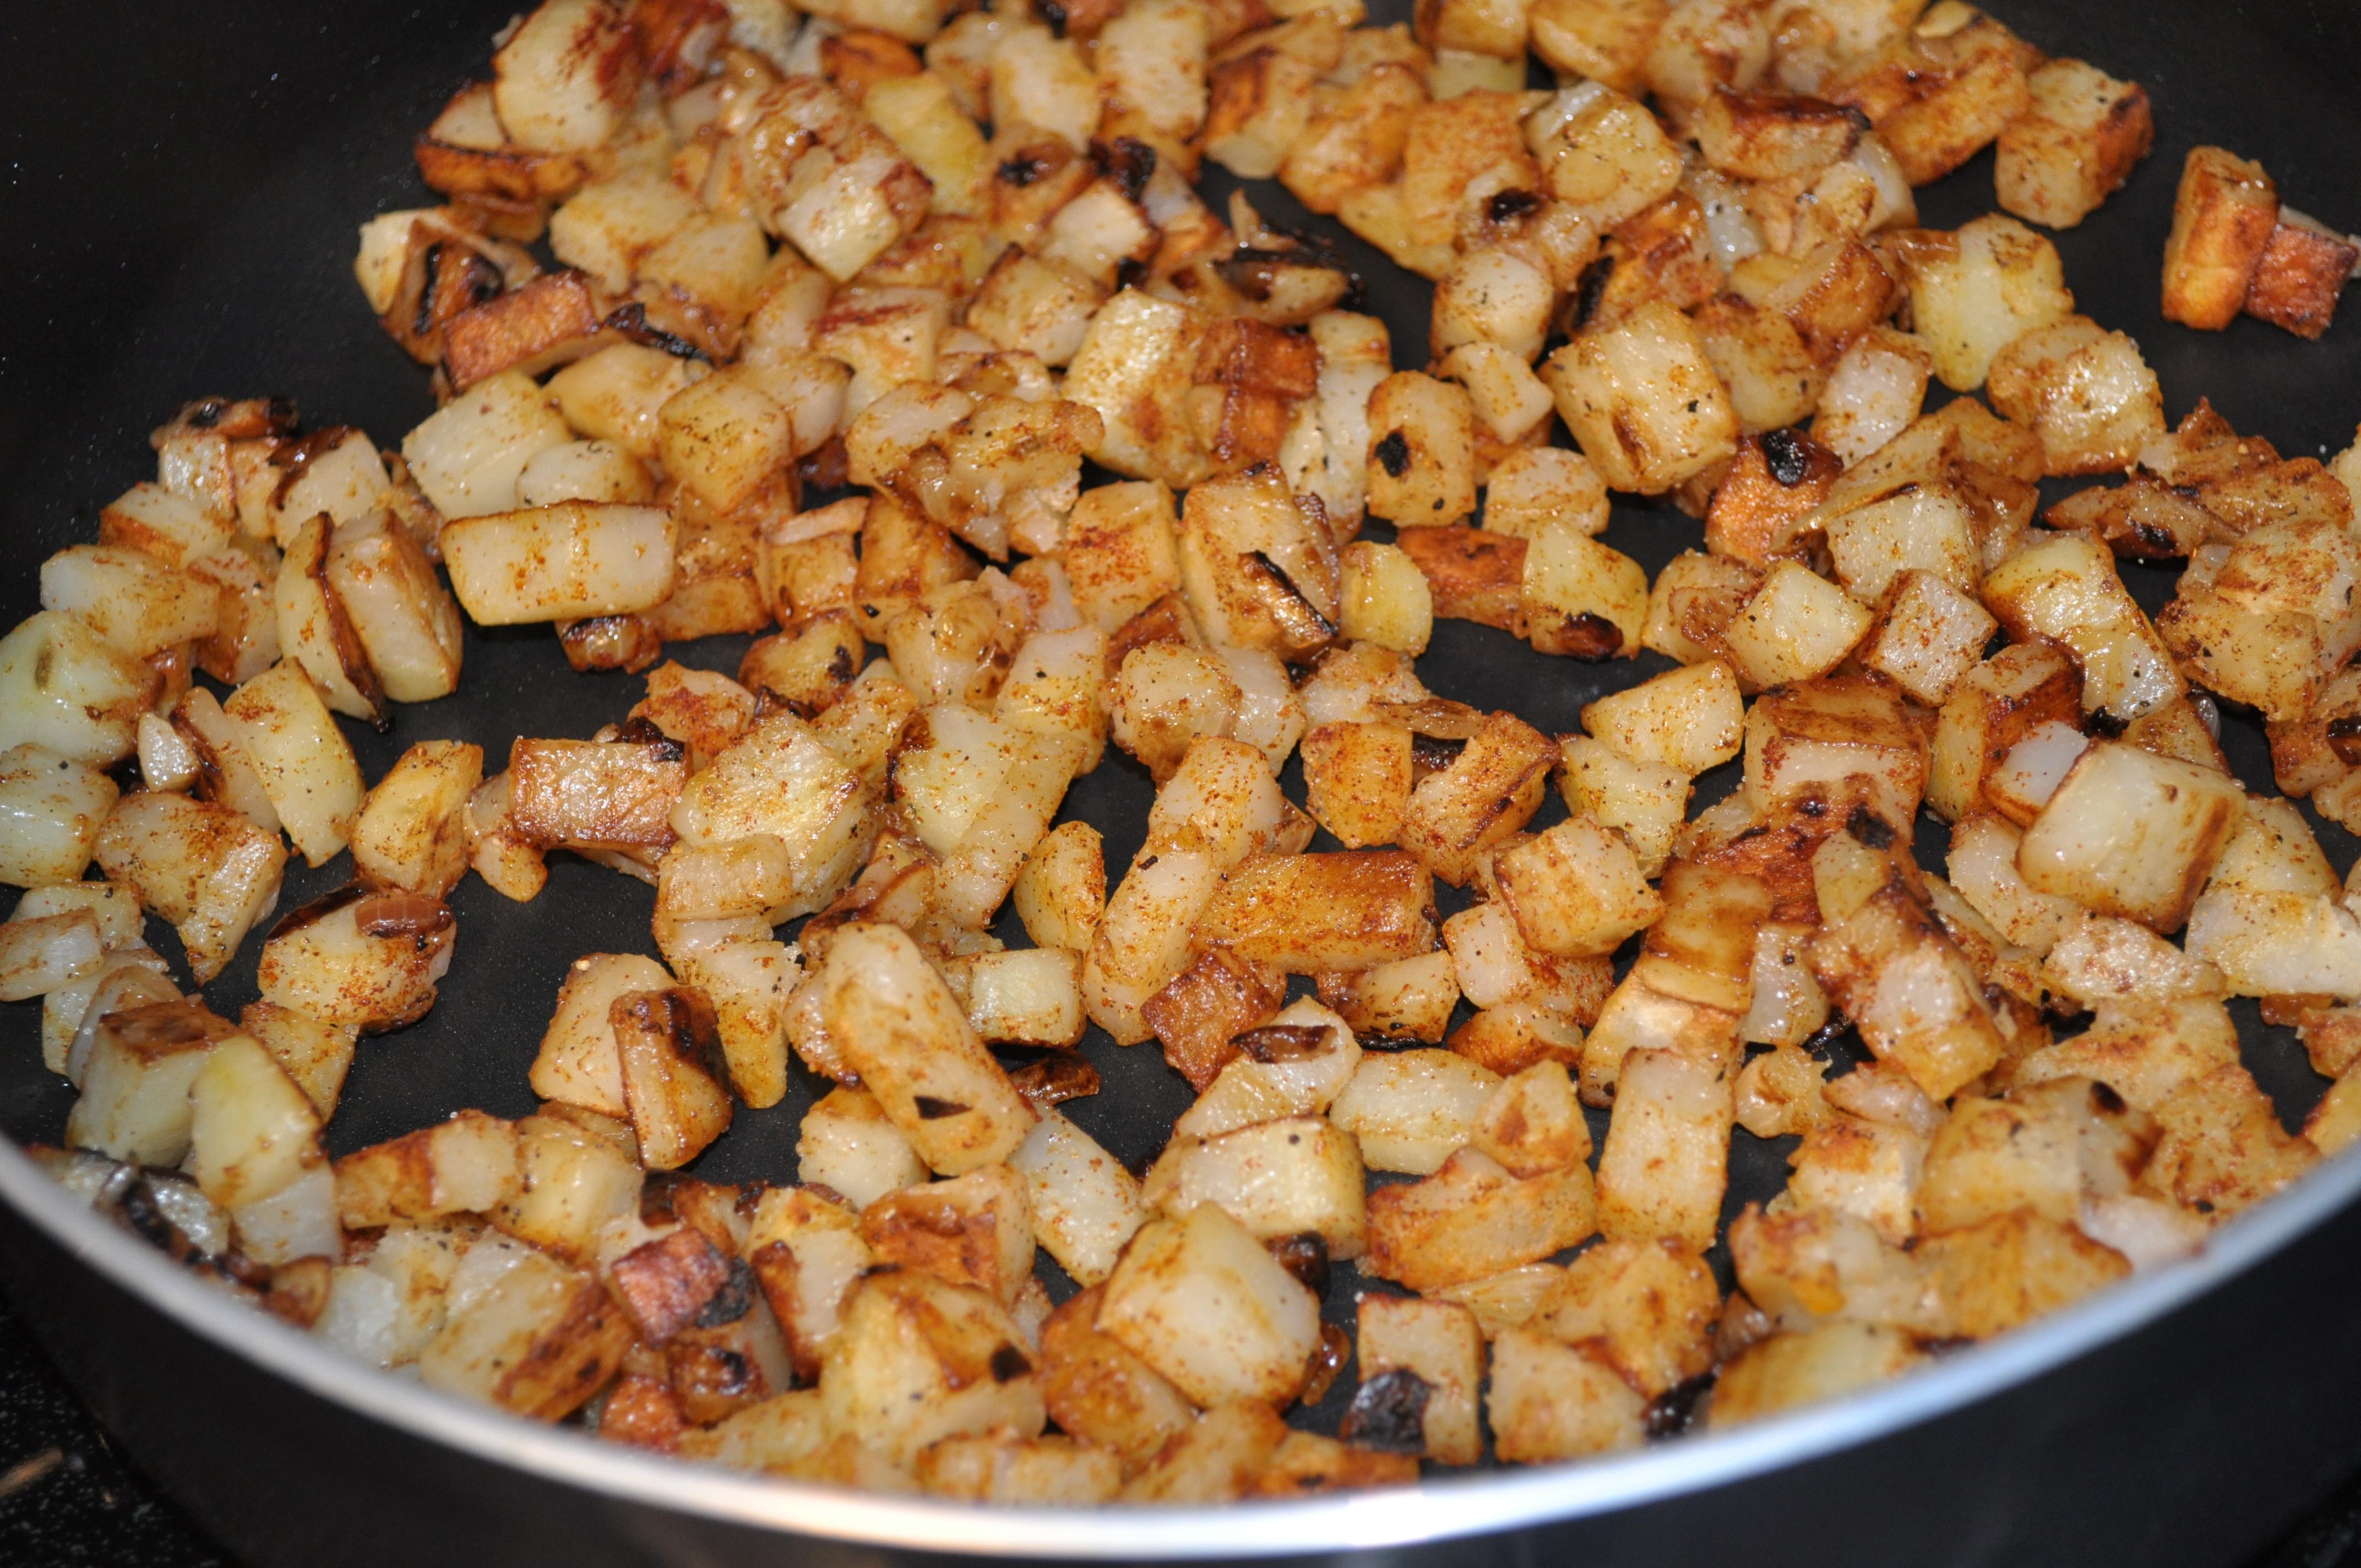 Fried Potato Recipes  Home Fried Potatoes Recipe